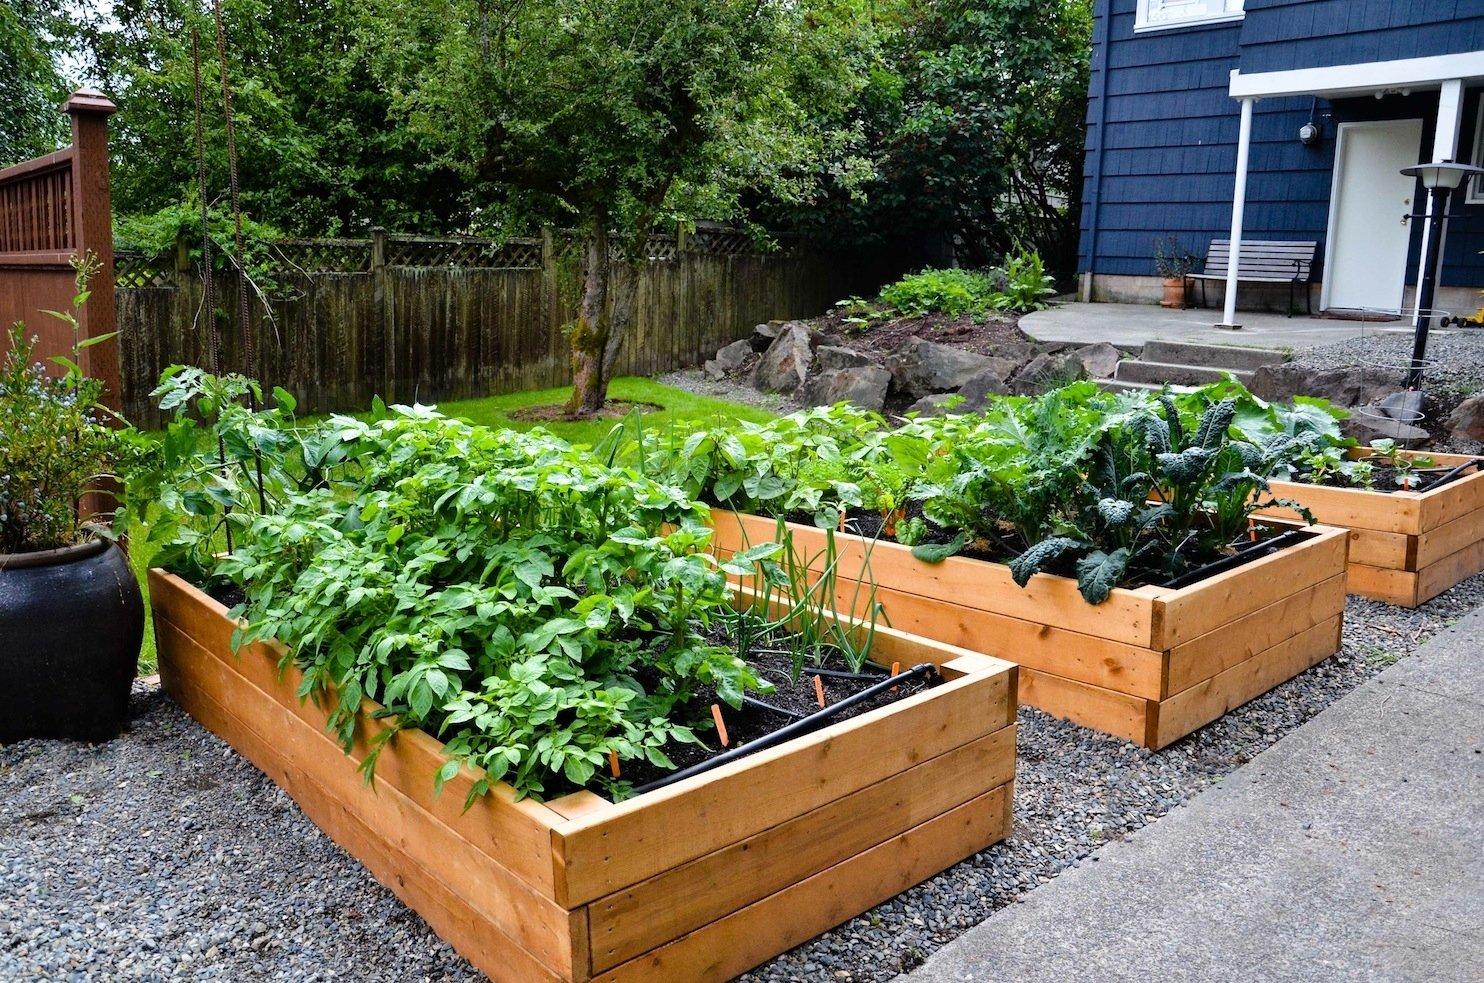 10 Unique Raised Bed Garden Design Ideas garden profile raised beds after planting 2053 latest decoration 2021